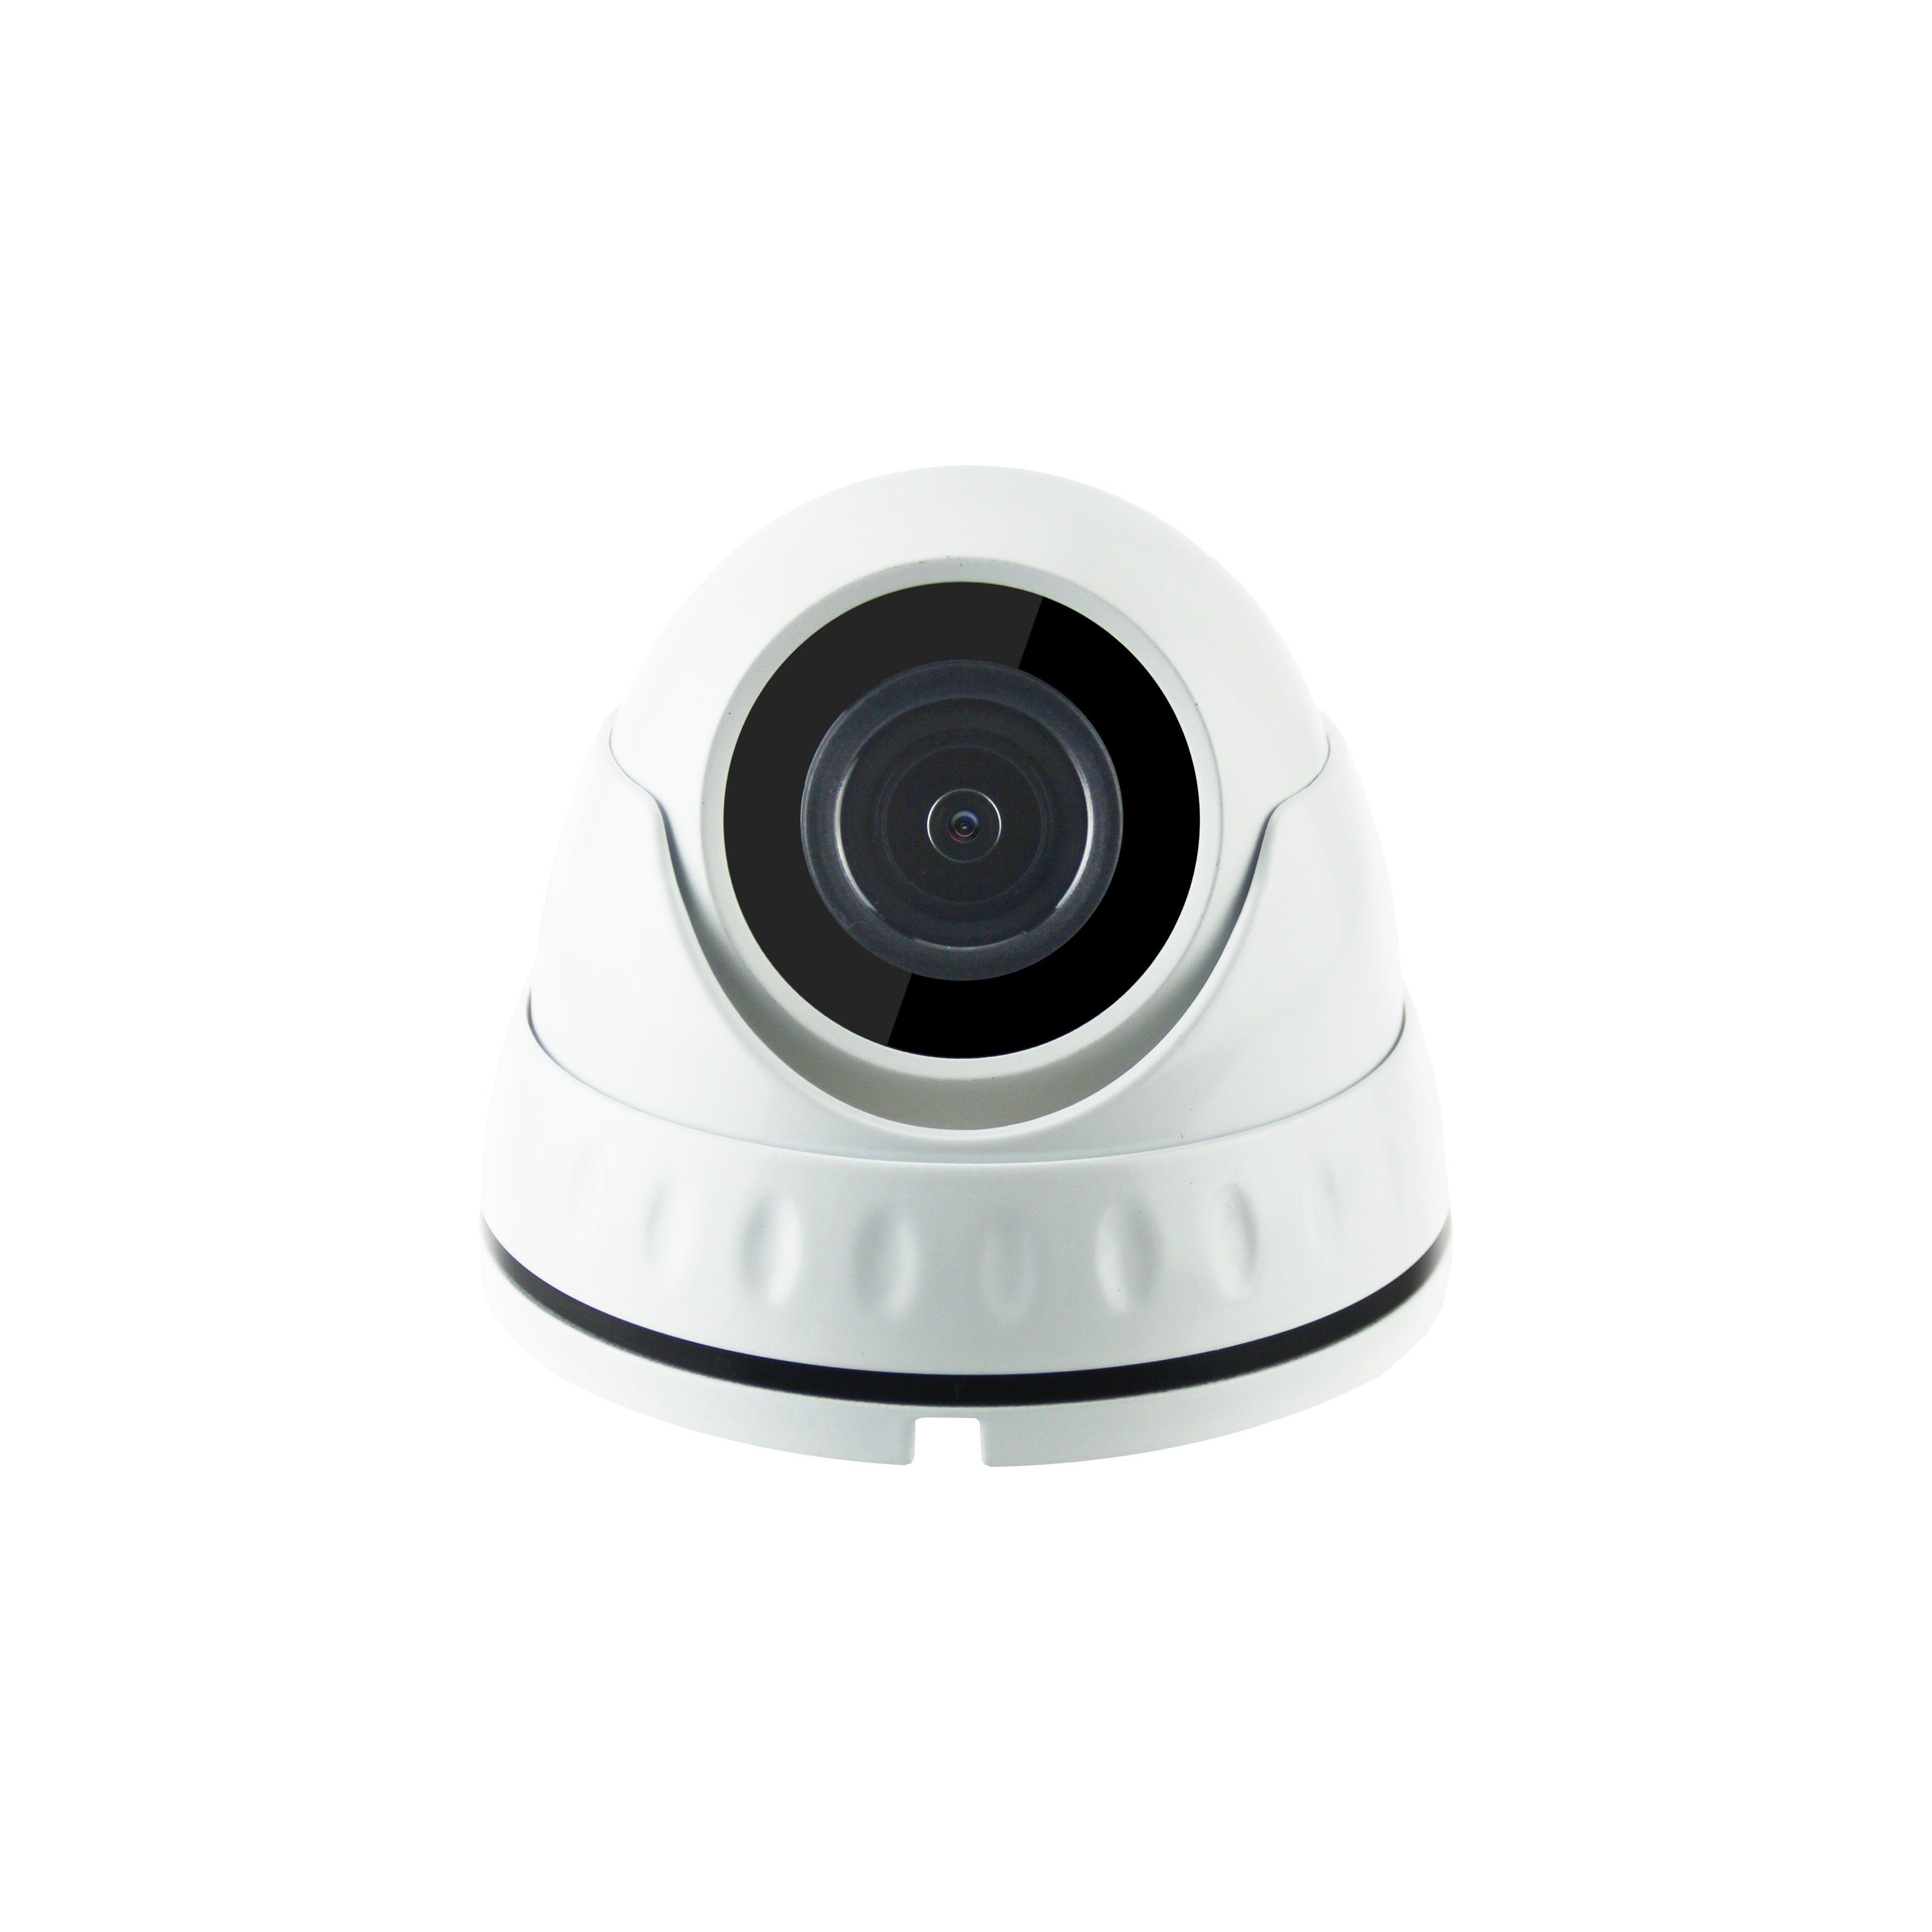 IP66 Waterproof Dome 2MP Sony Sensor Surveillance IP Camera (KIP-200SL20H)